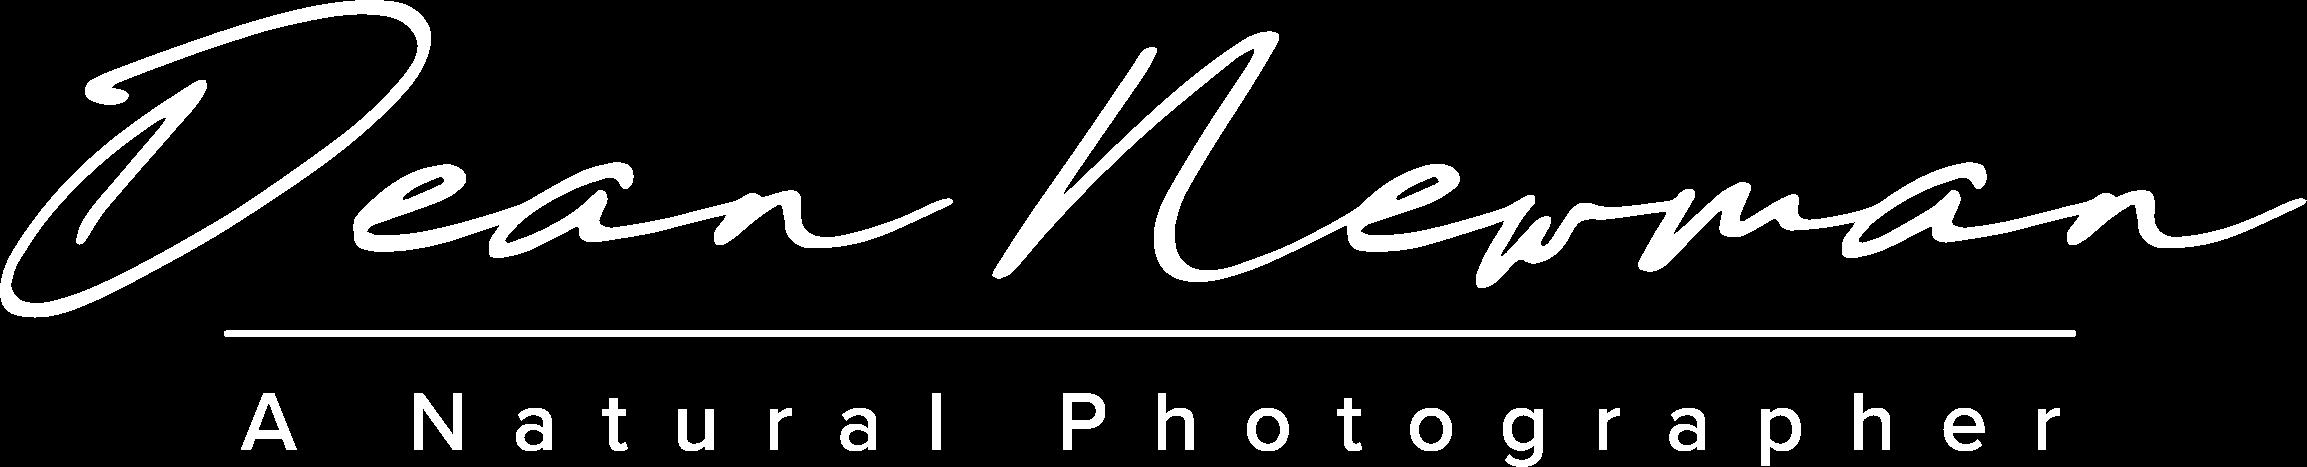 Dean Newman Photography